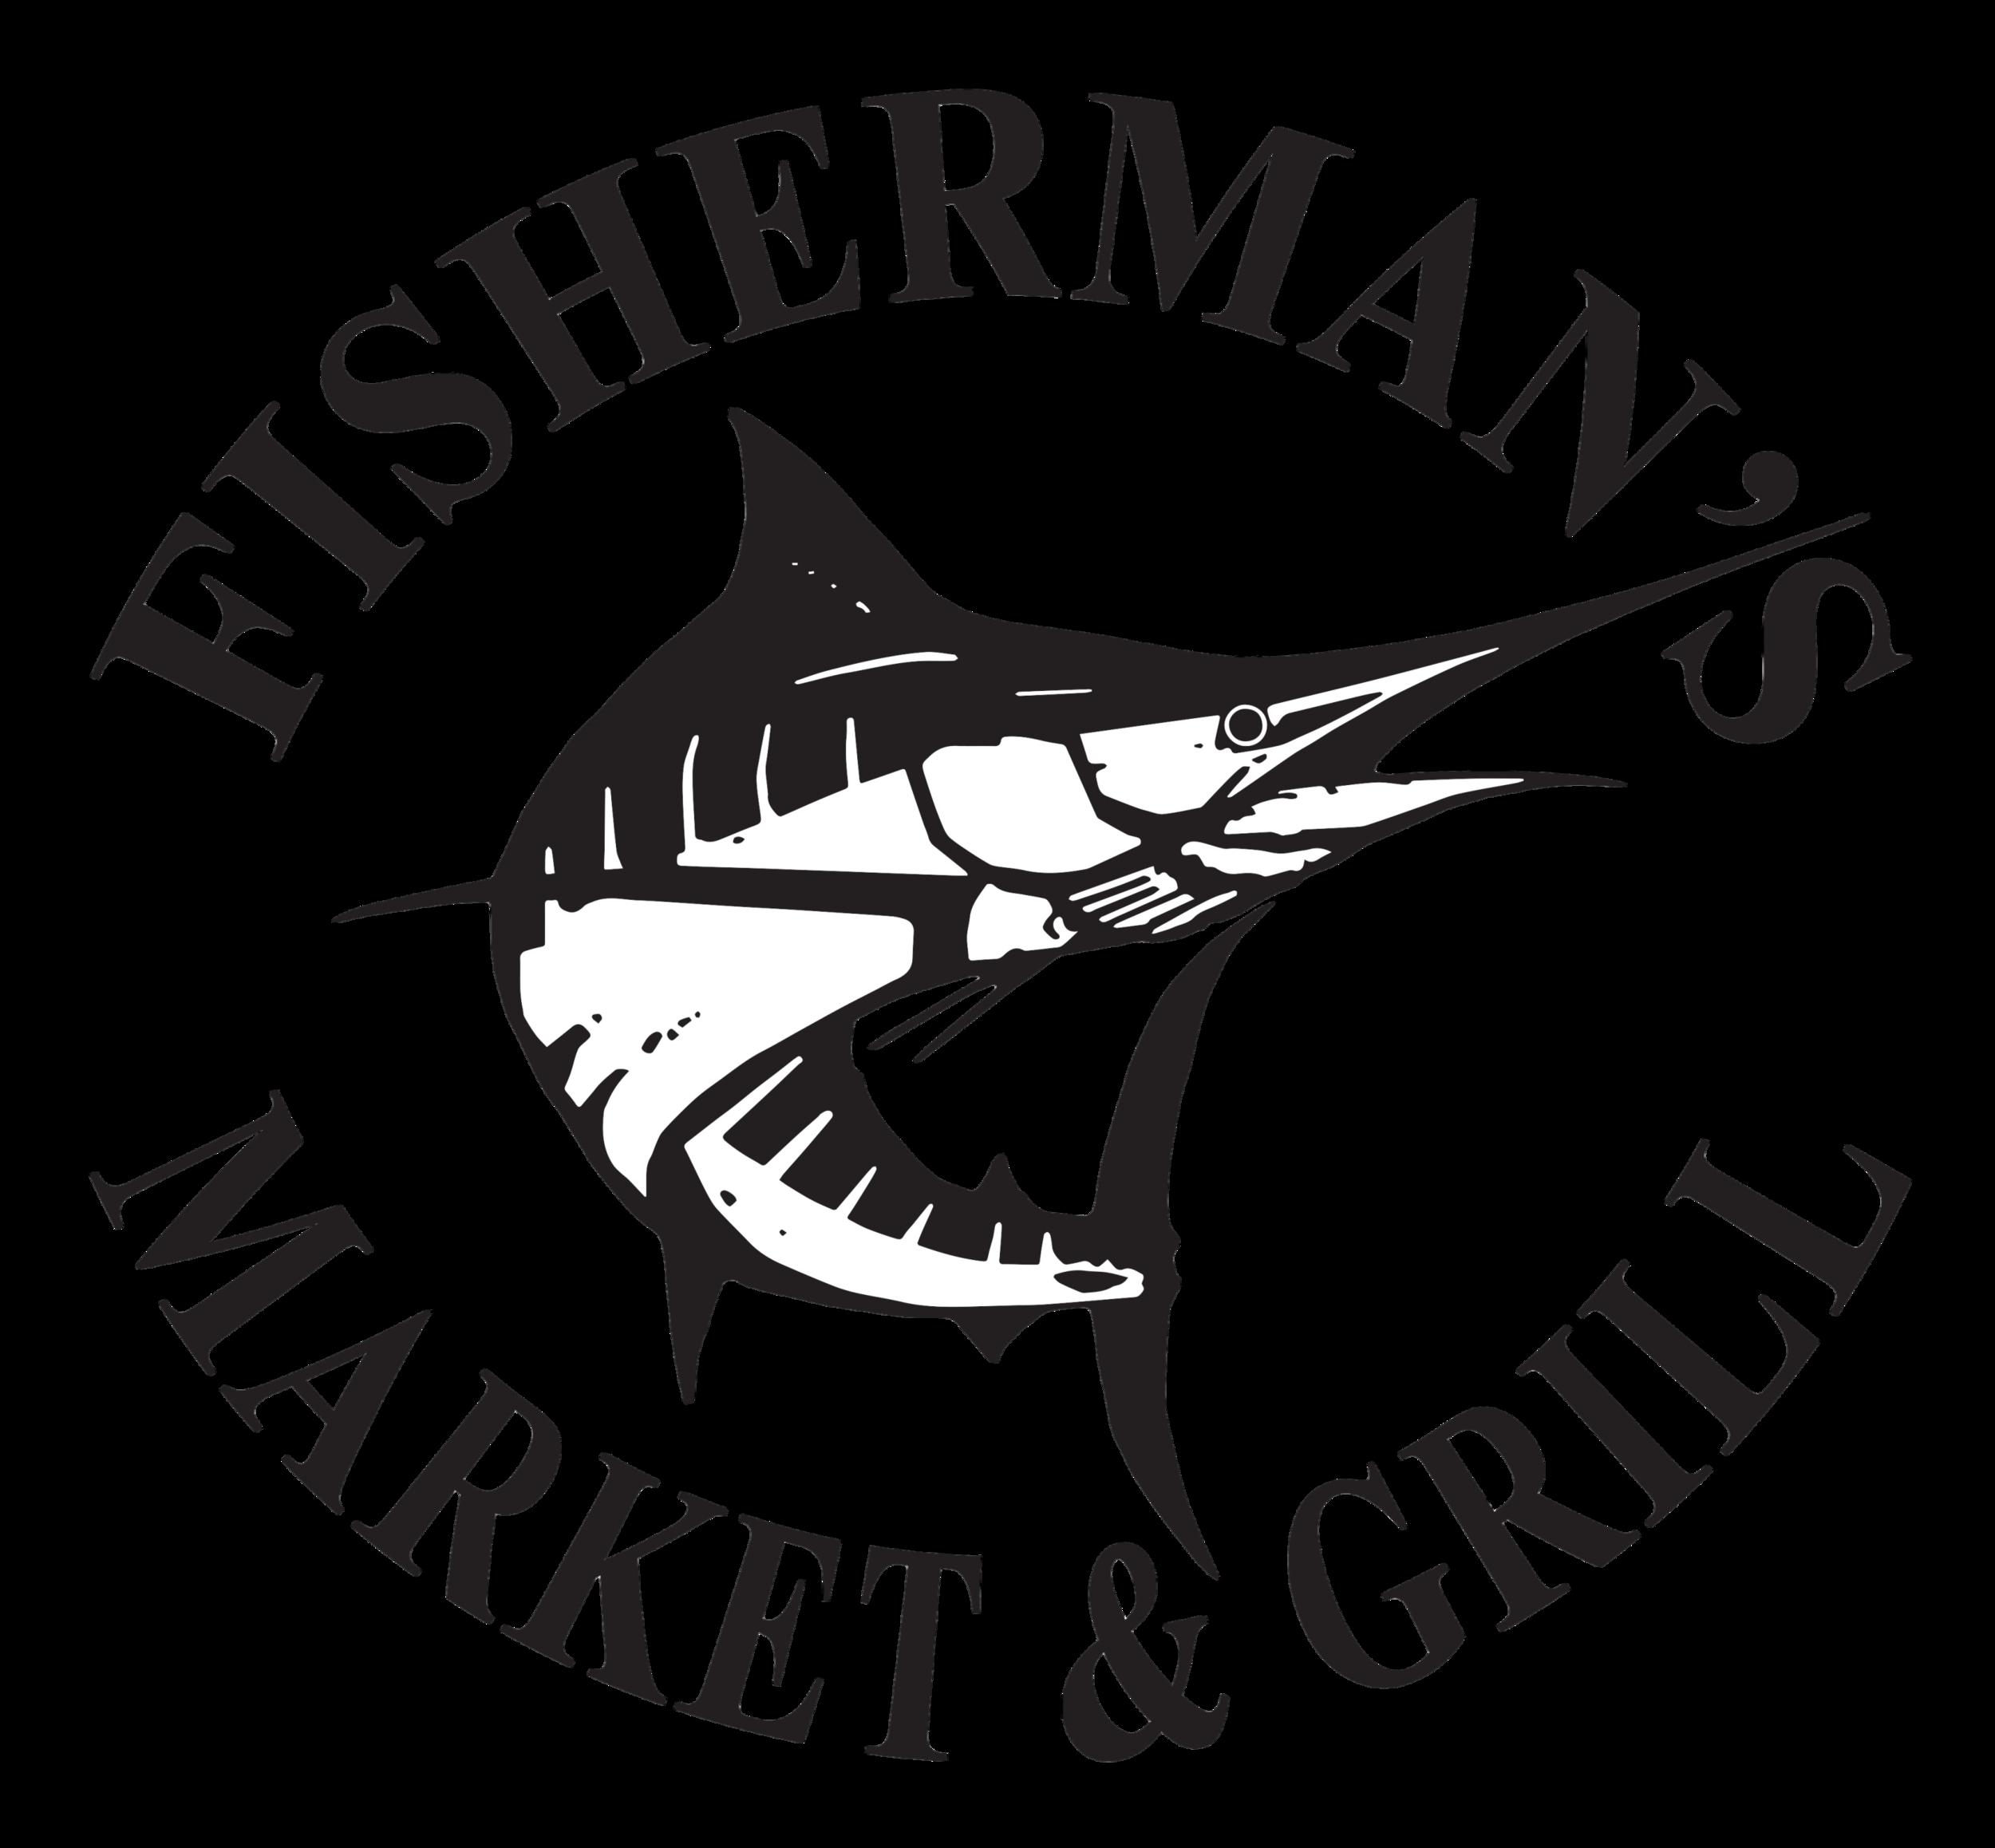 Fisherman's Circular Logo trans black.png